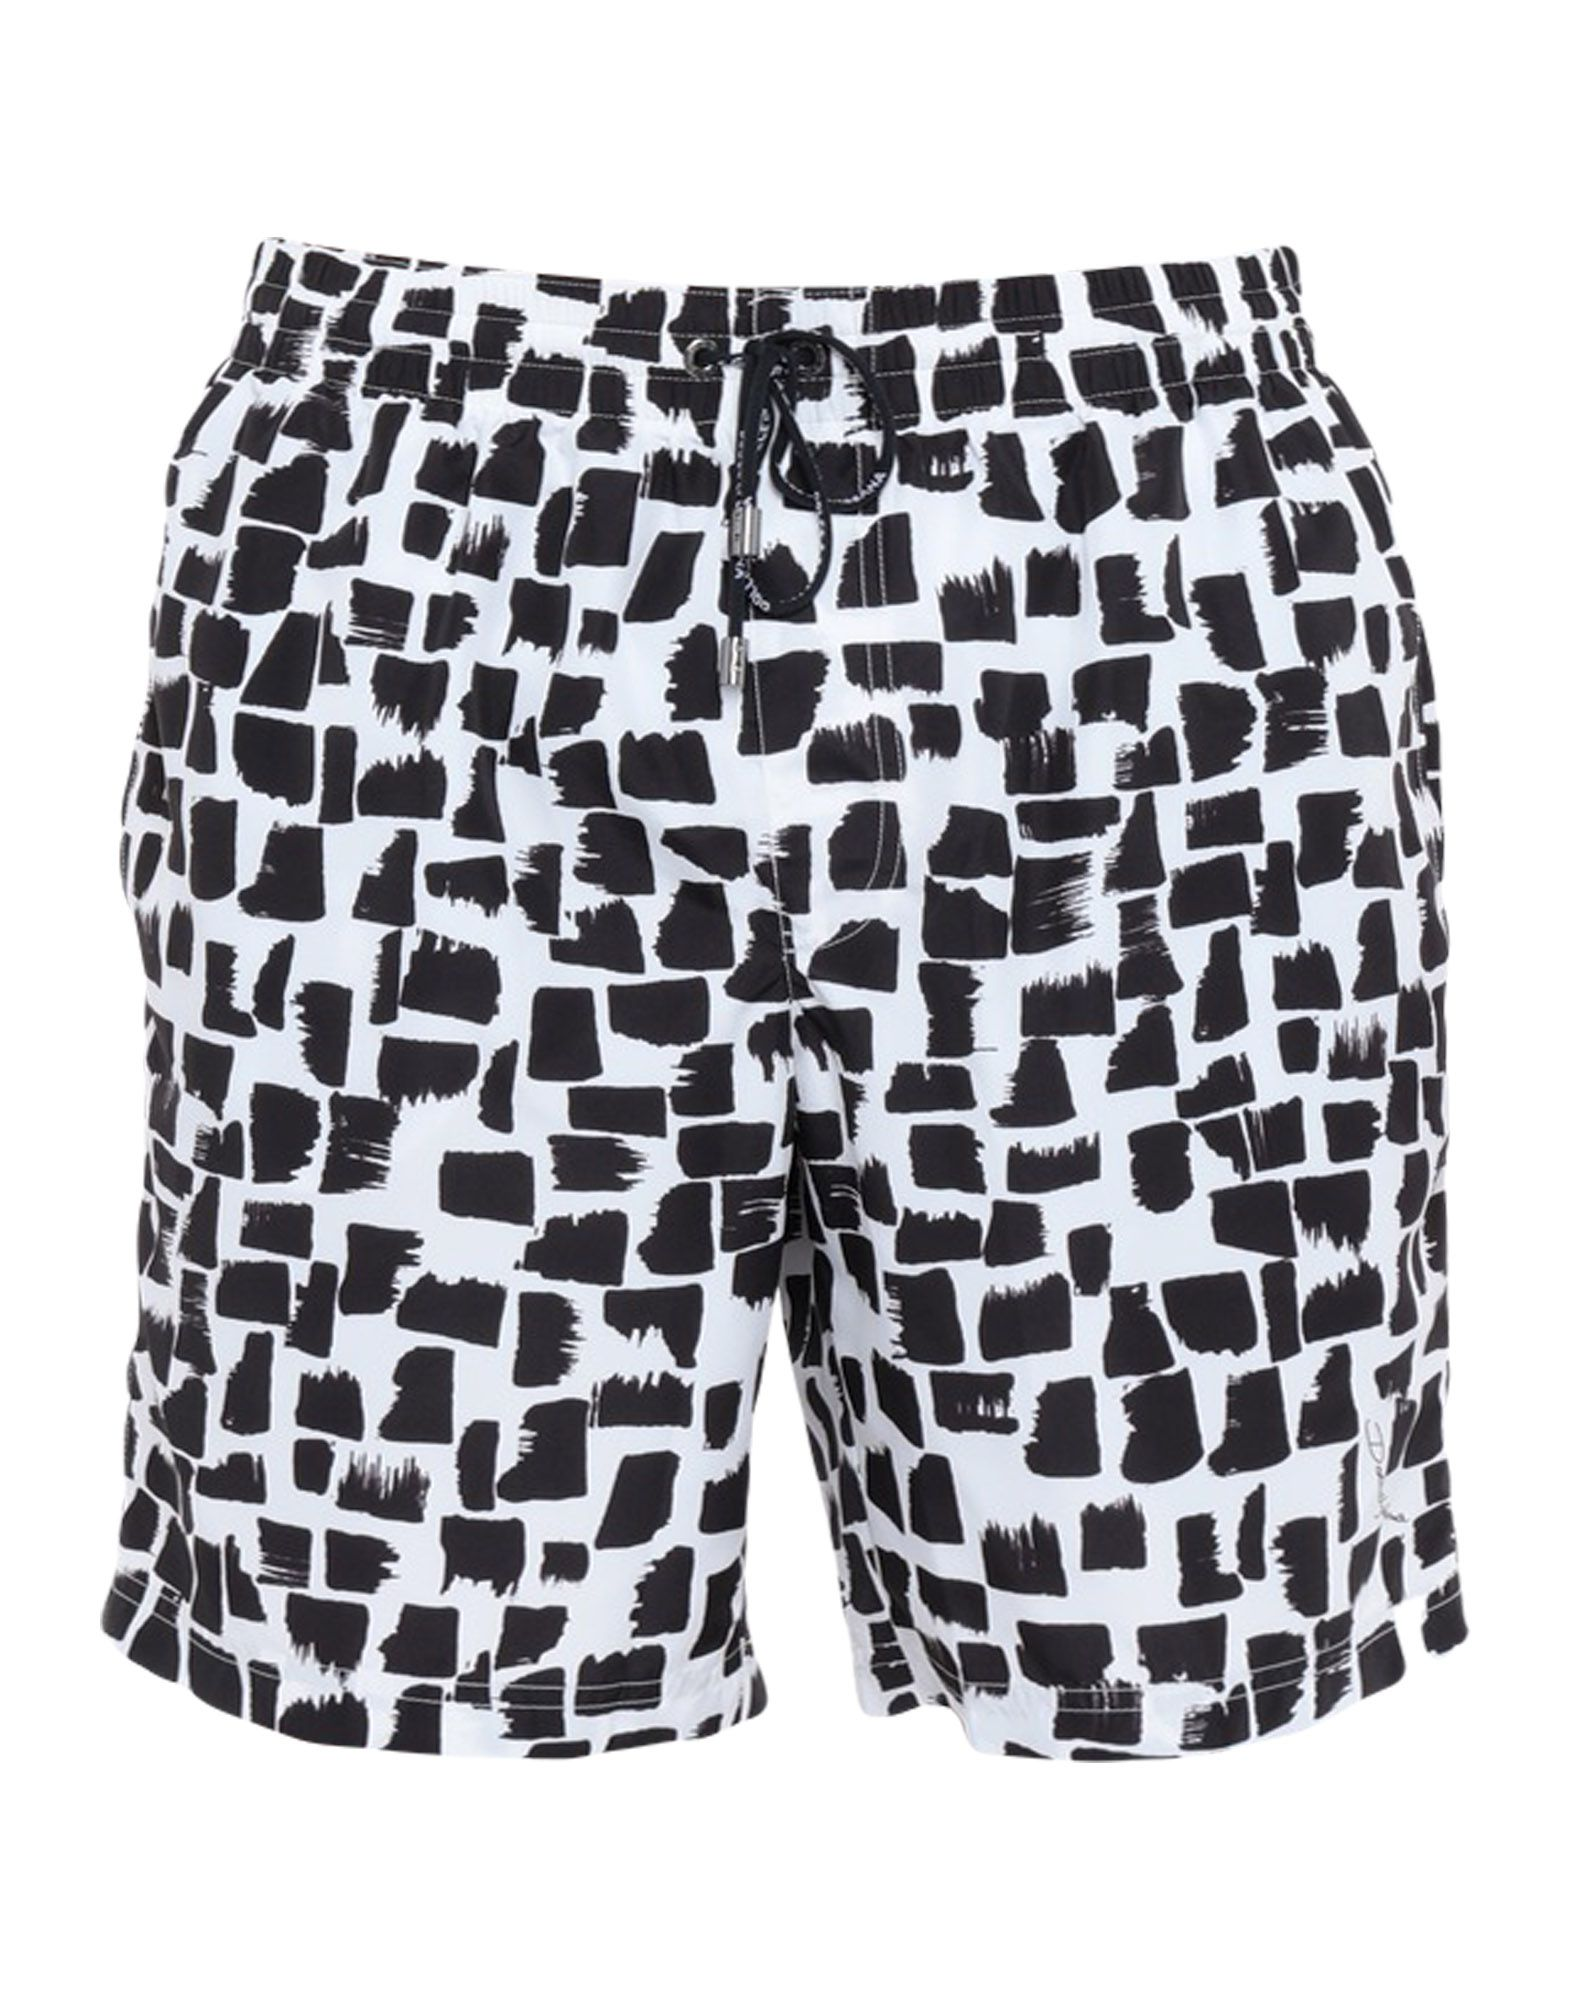 8f2d5e725bcfa Men's swimwear: swimsuit, bathing suit and swimming trunks   YOOX